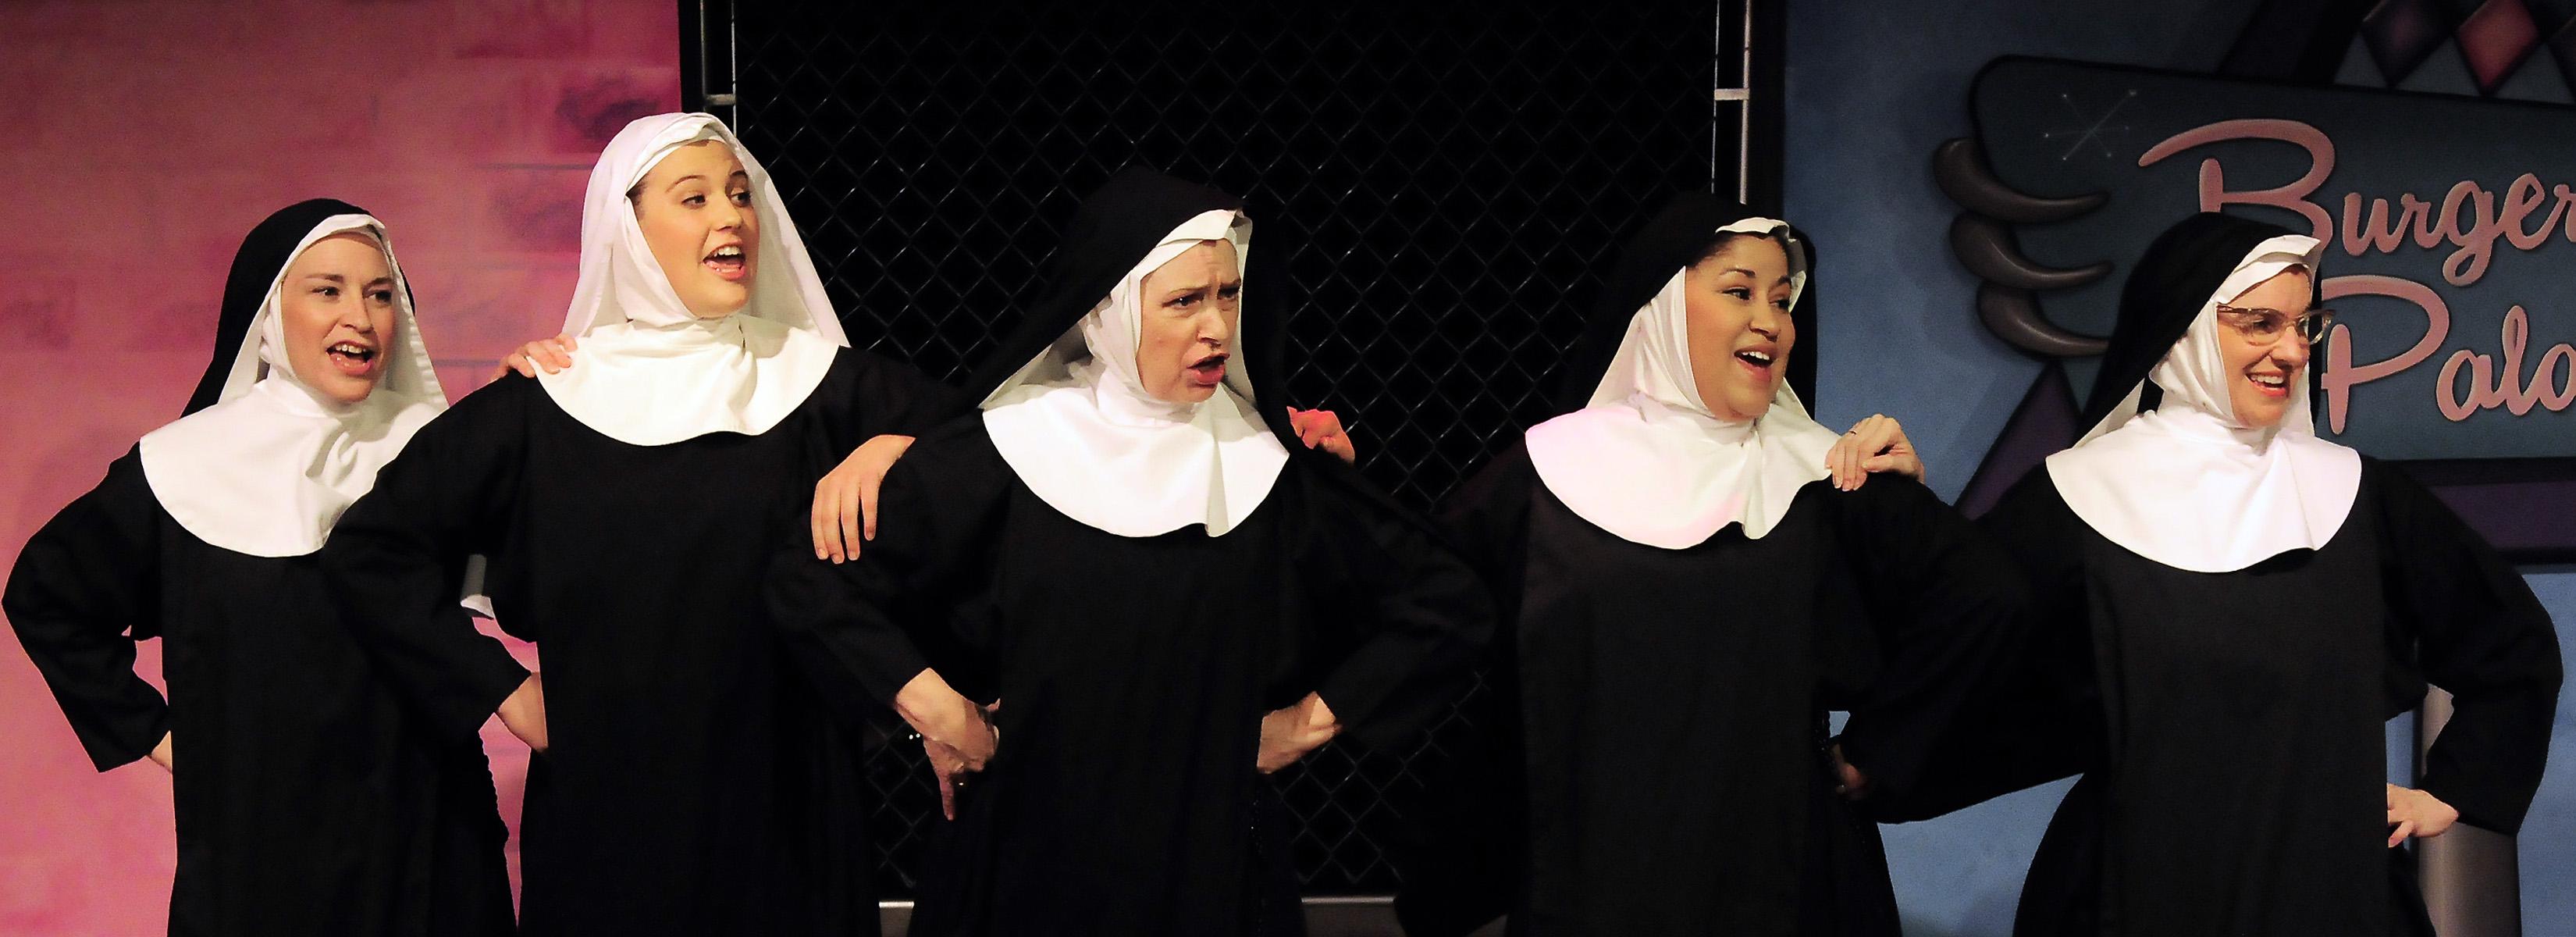 Nun Group